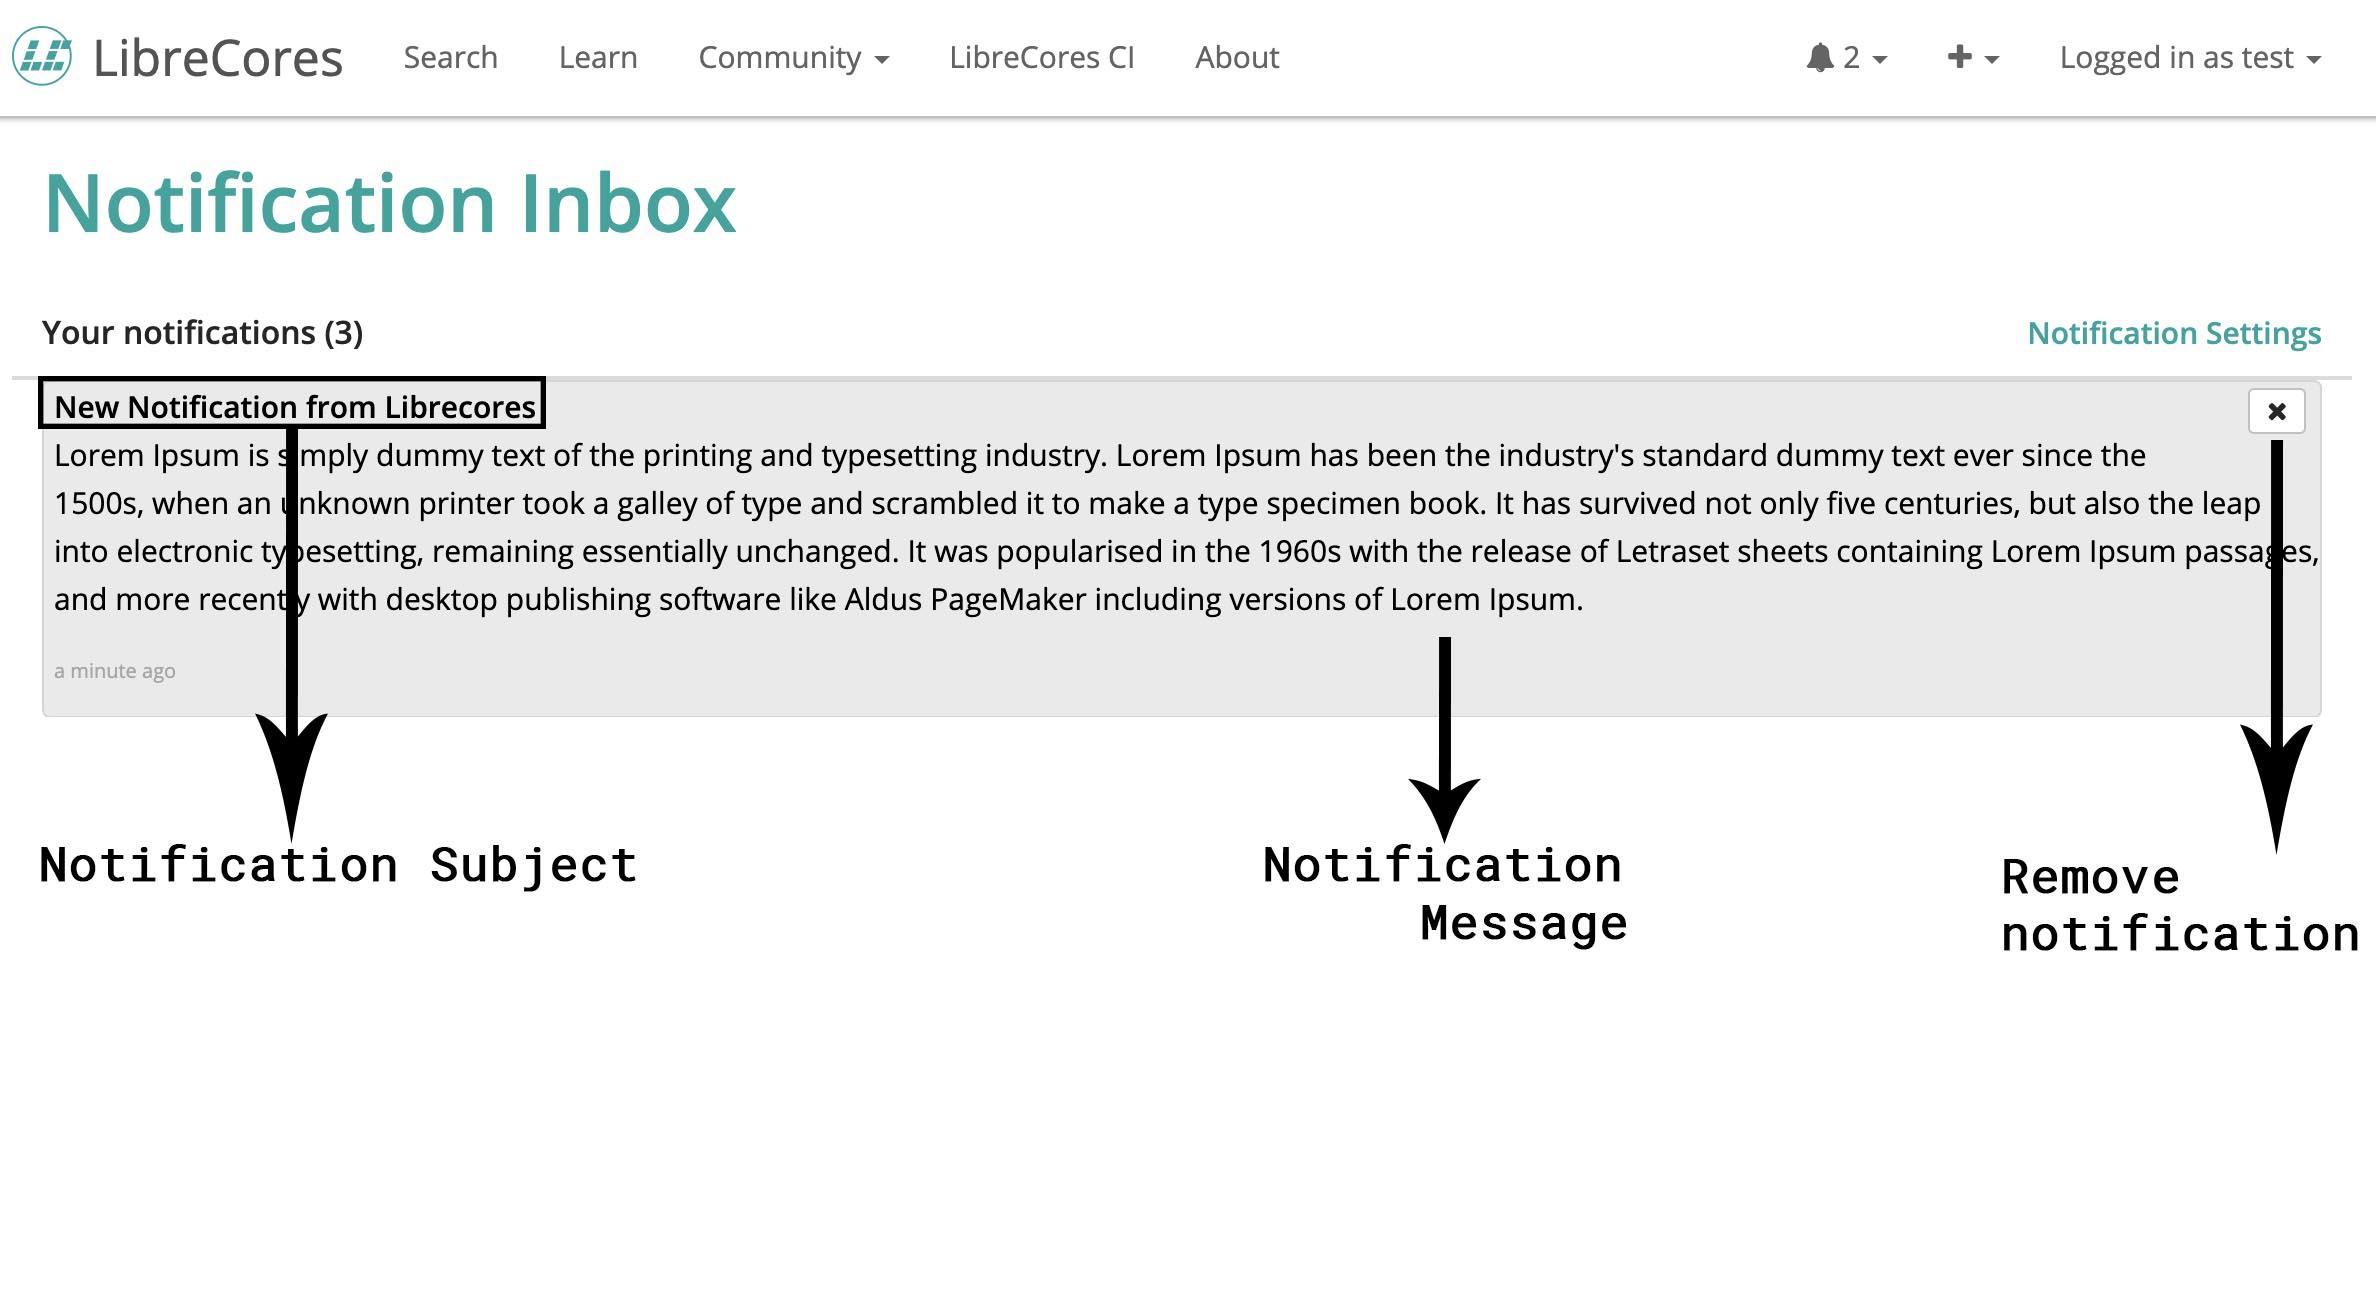 Notification Inbox